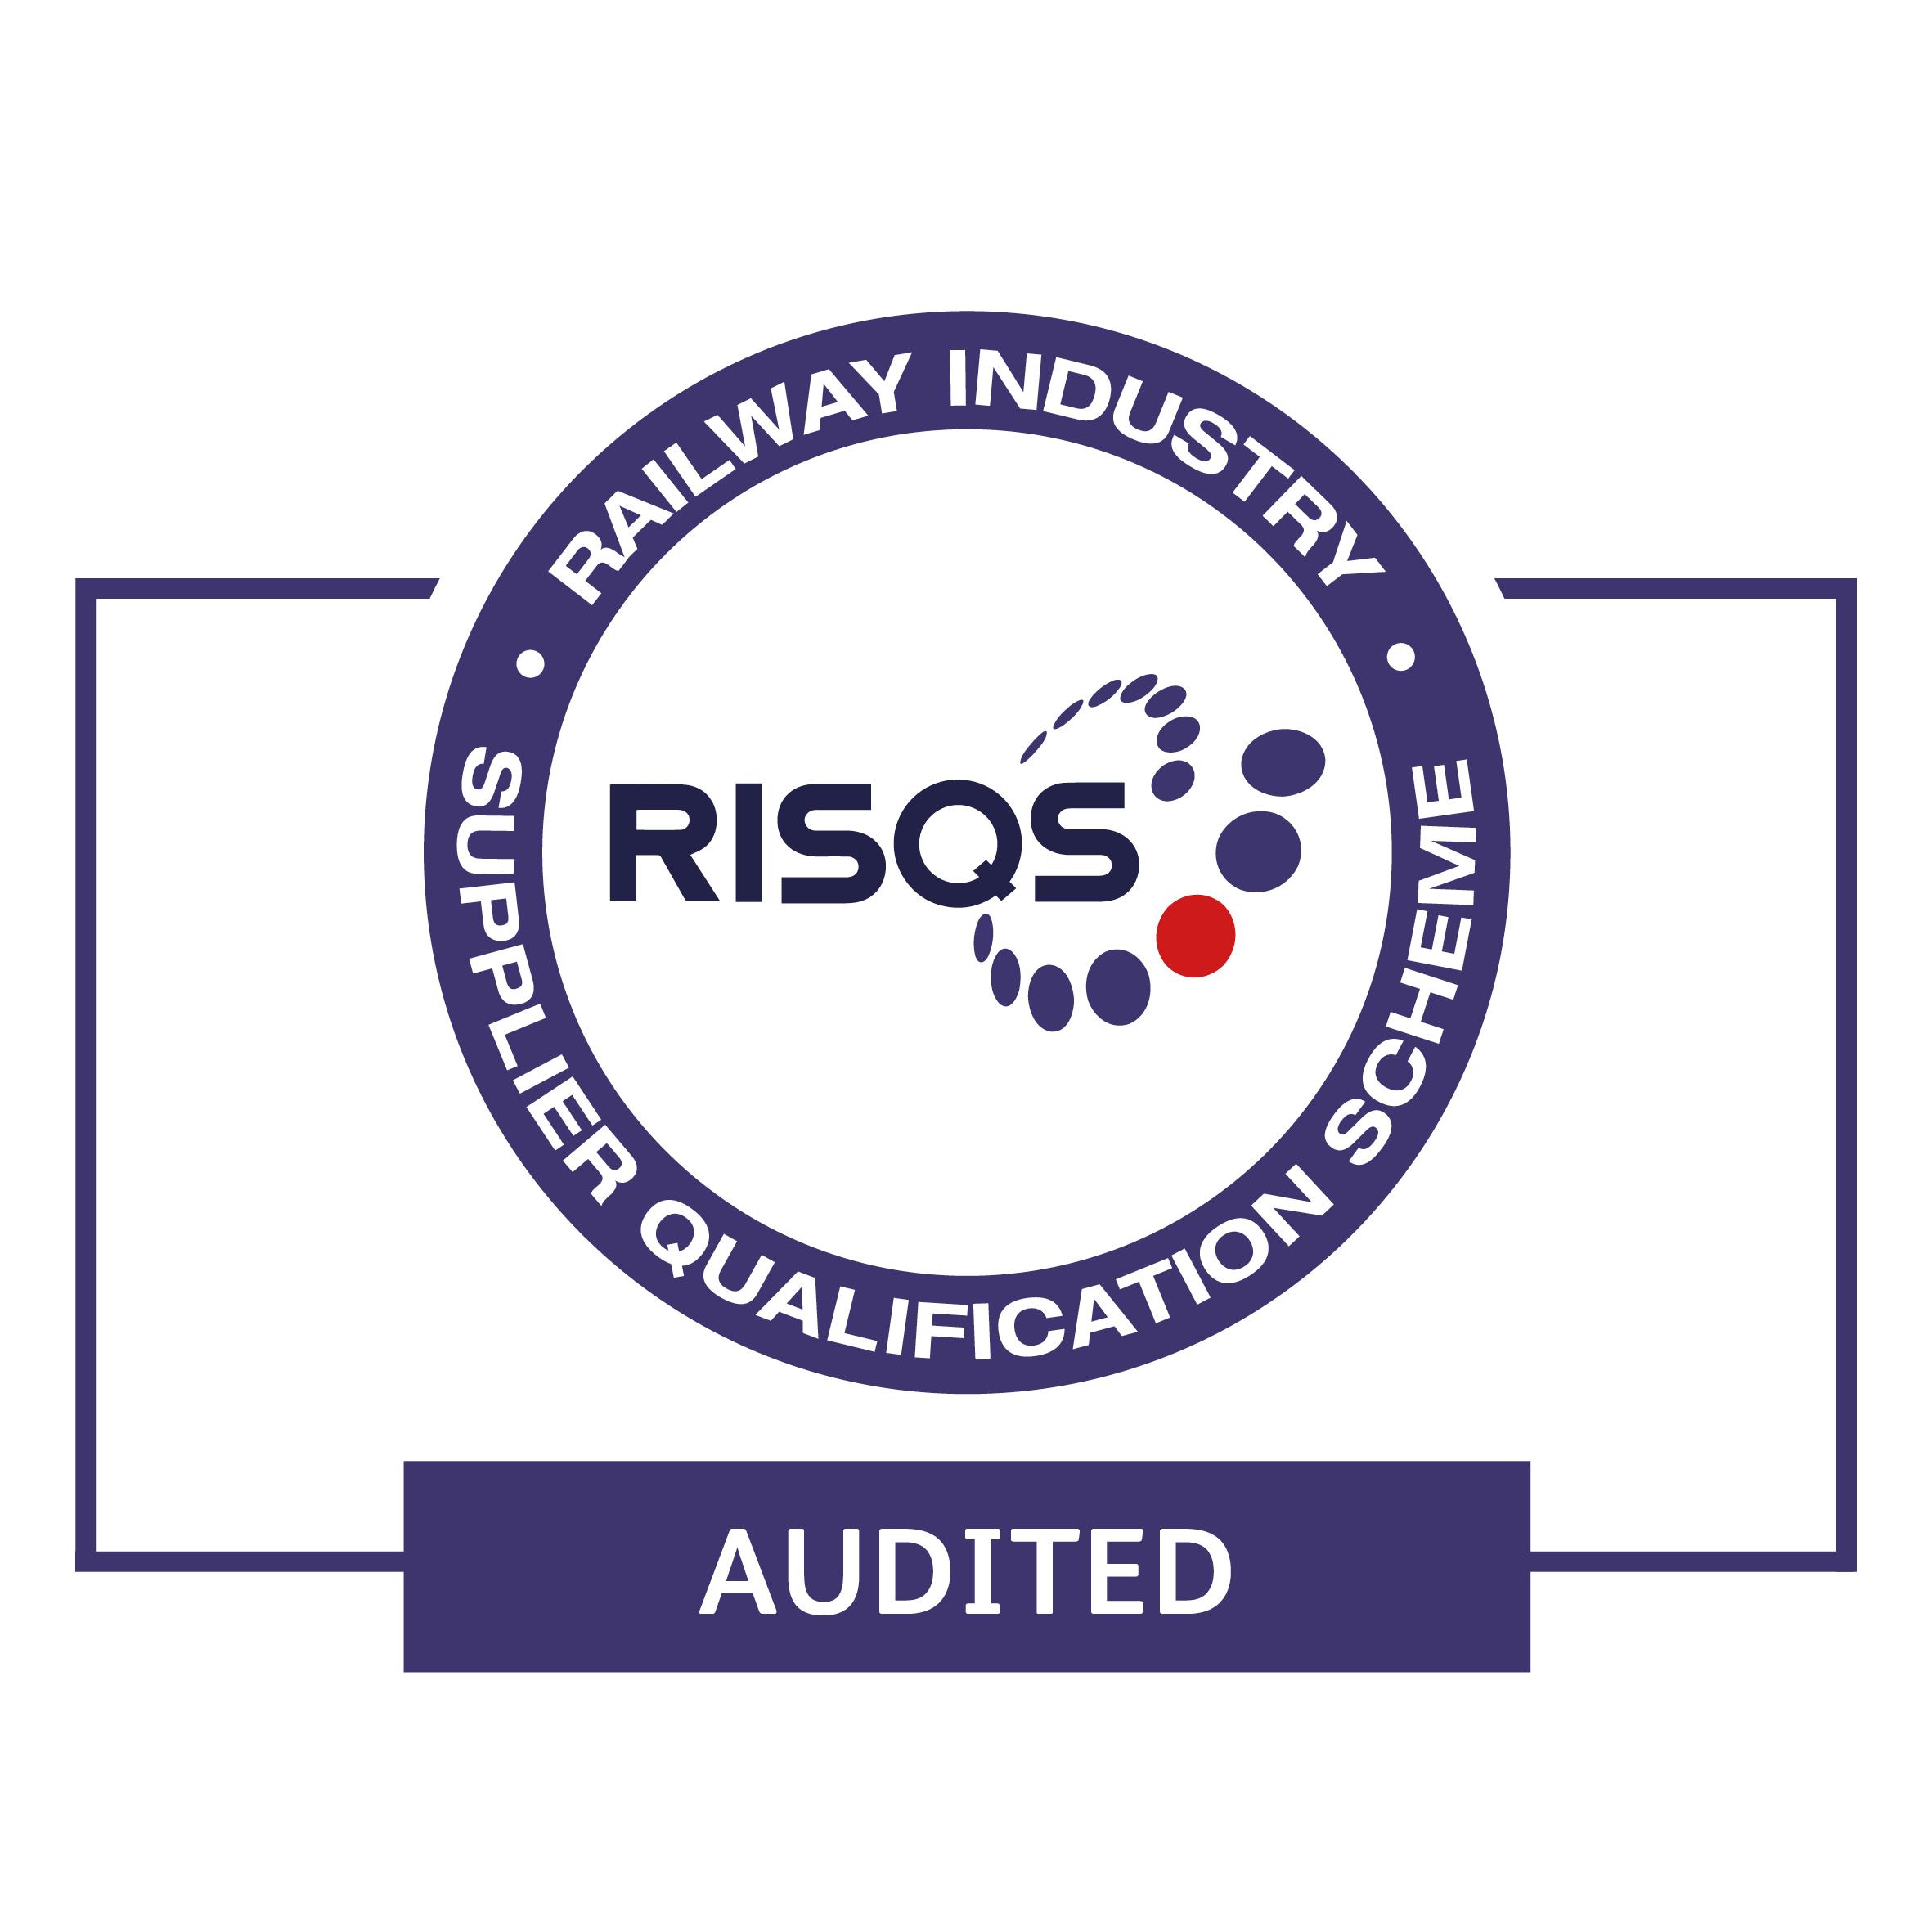 RISQS Audited - SVM Glasgow